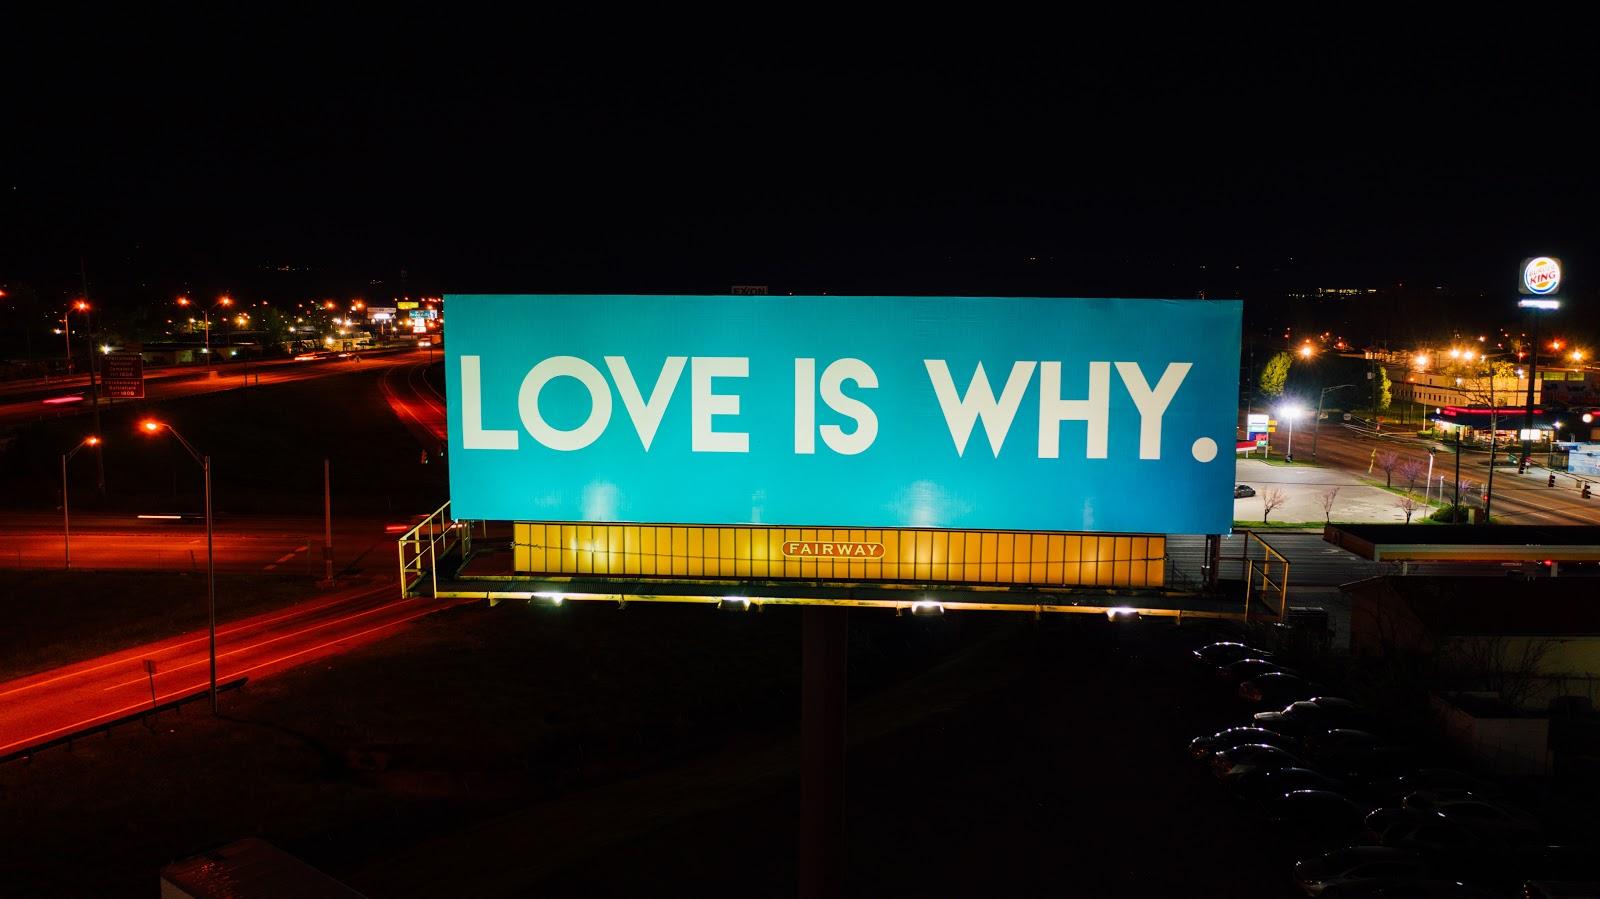 advertising billboards on the street